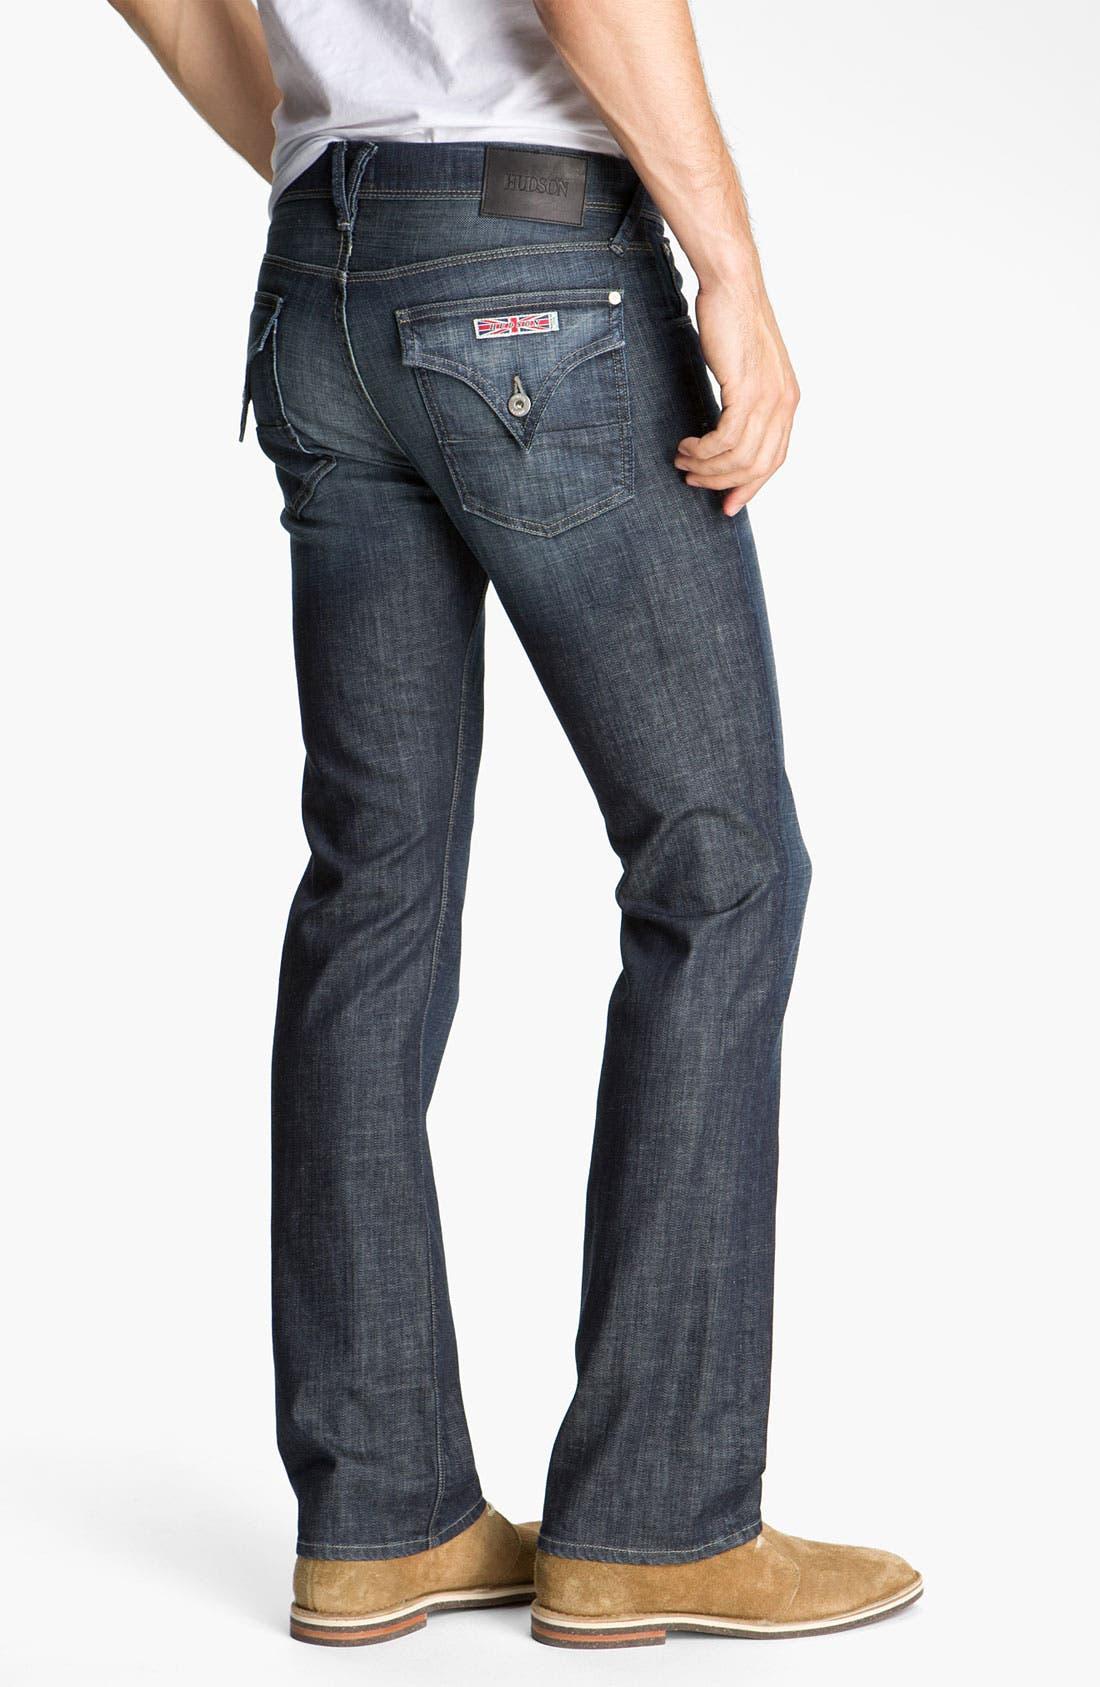 Main Image - Hudson Jeans 'Clifton' Bootcut Jeans (Rockshire)